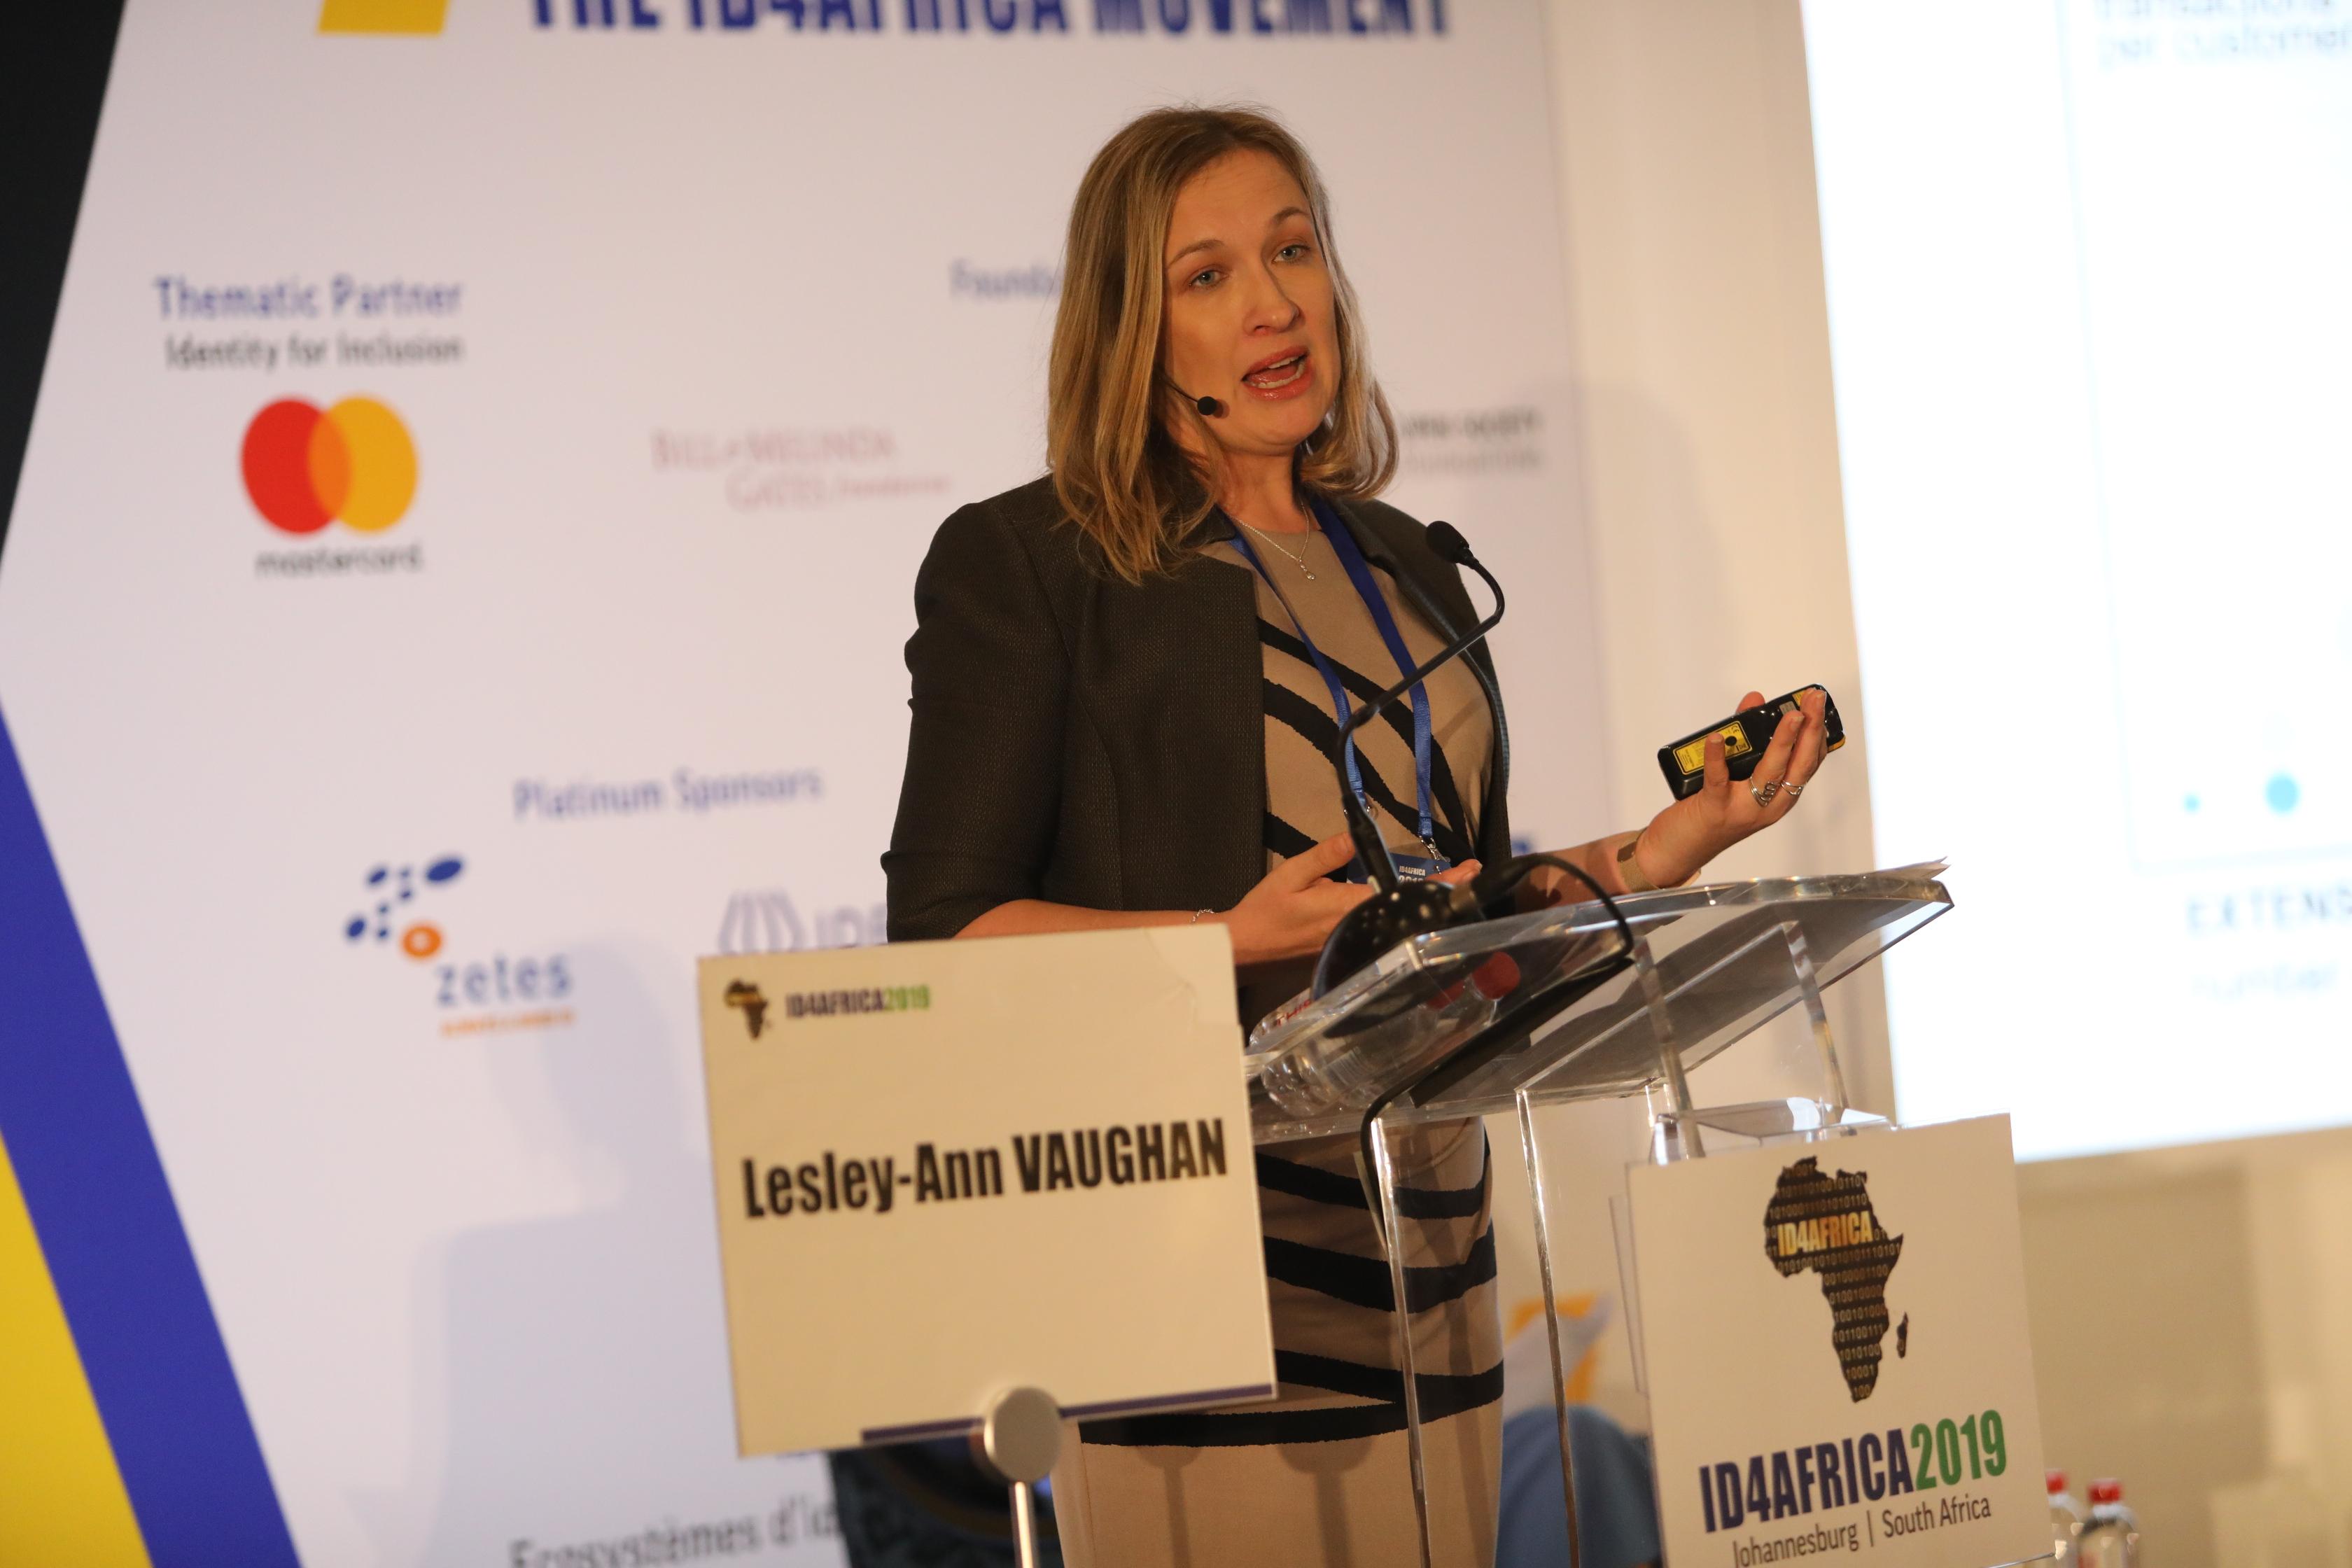 InF10-Lesley-Ann VAUGHAN